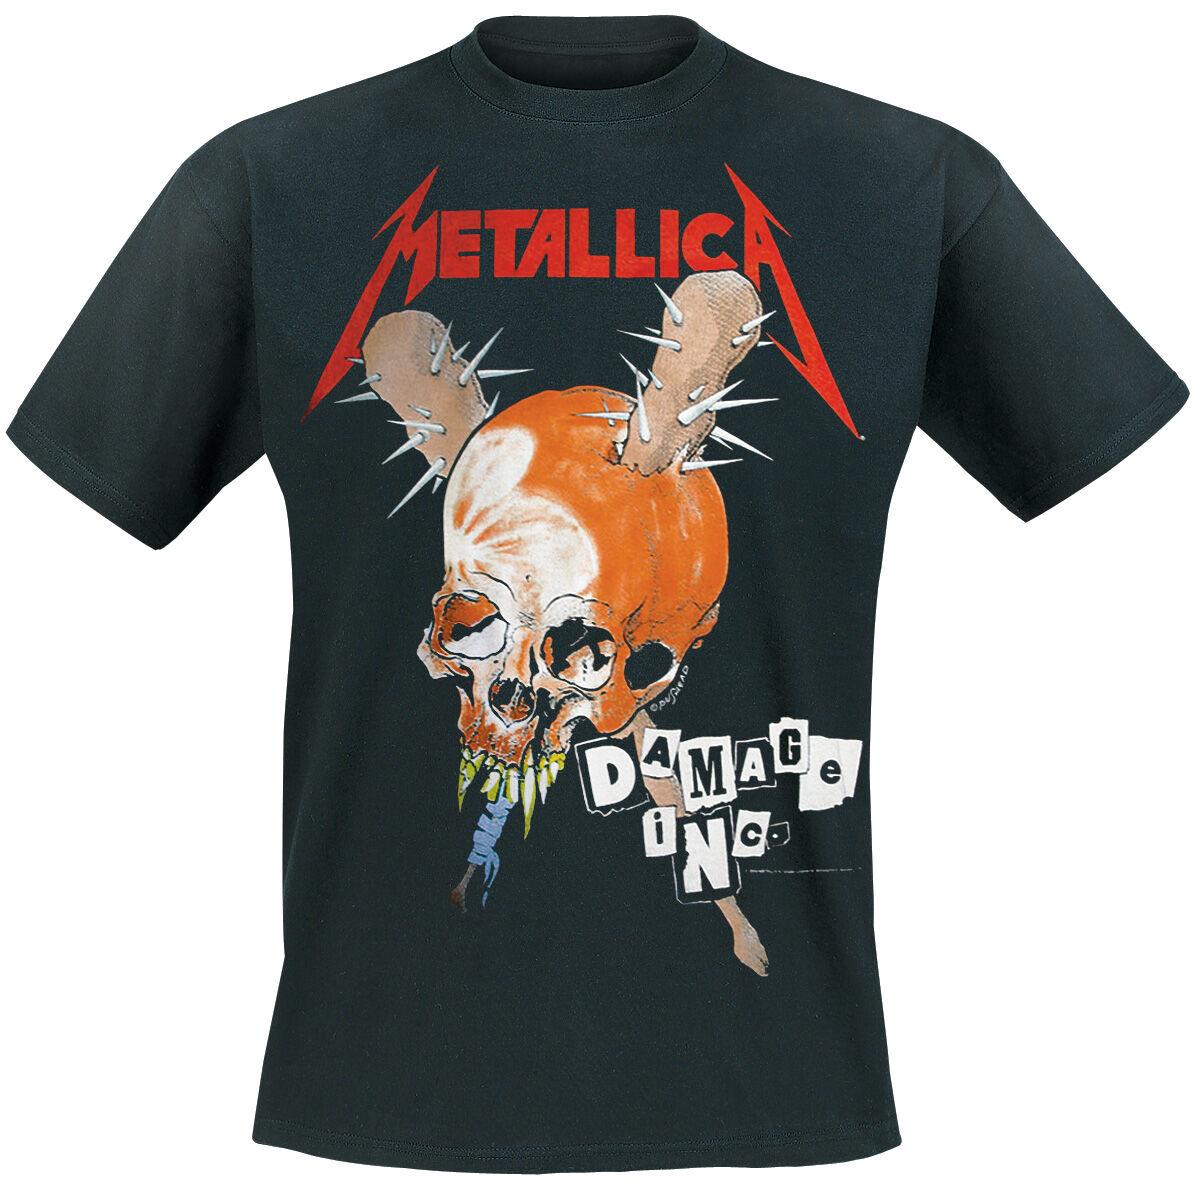 Image of   Metallica Damage Inc. T-Shirt sort